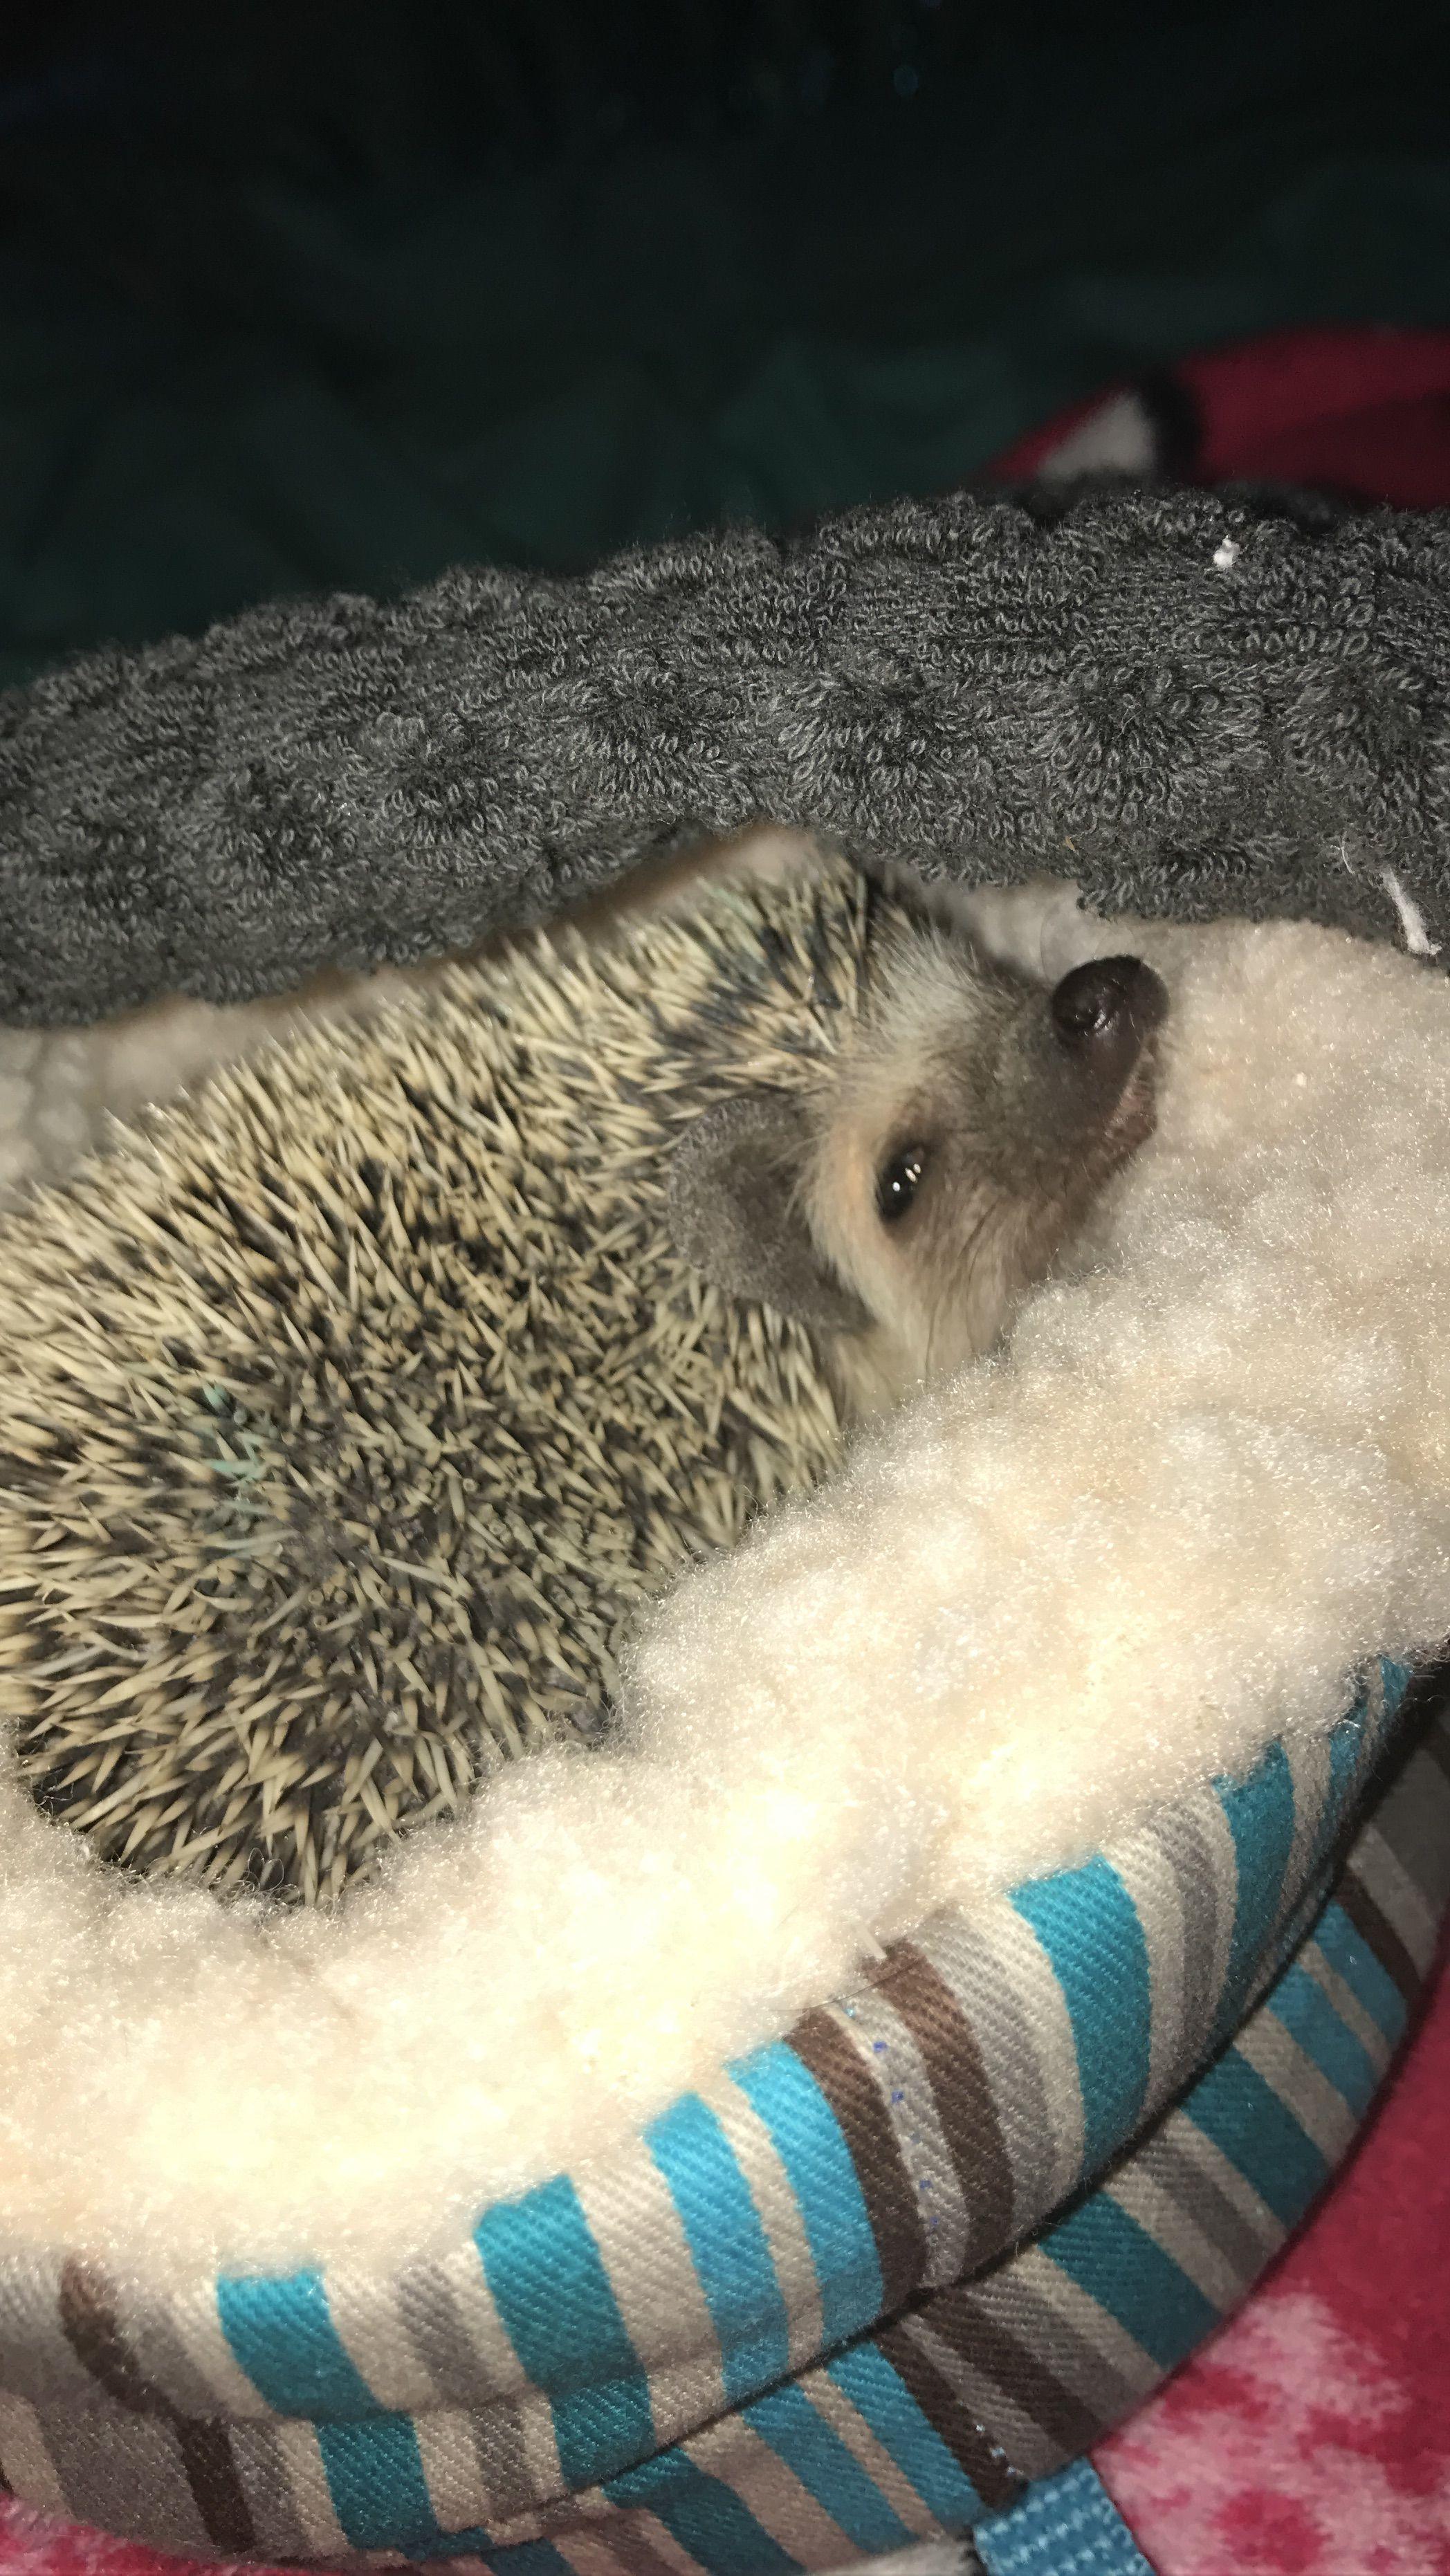 R u serious?? #hedgehog #jacinta